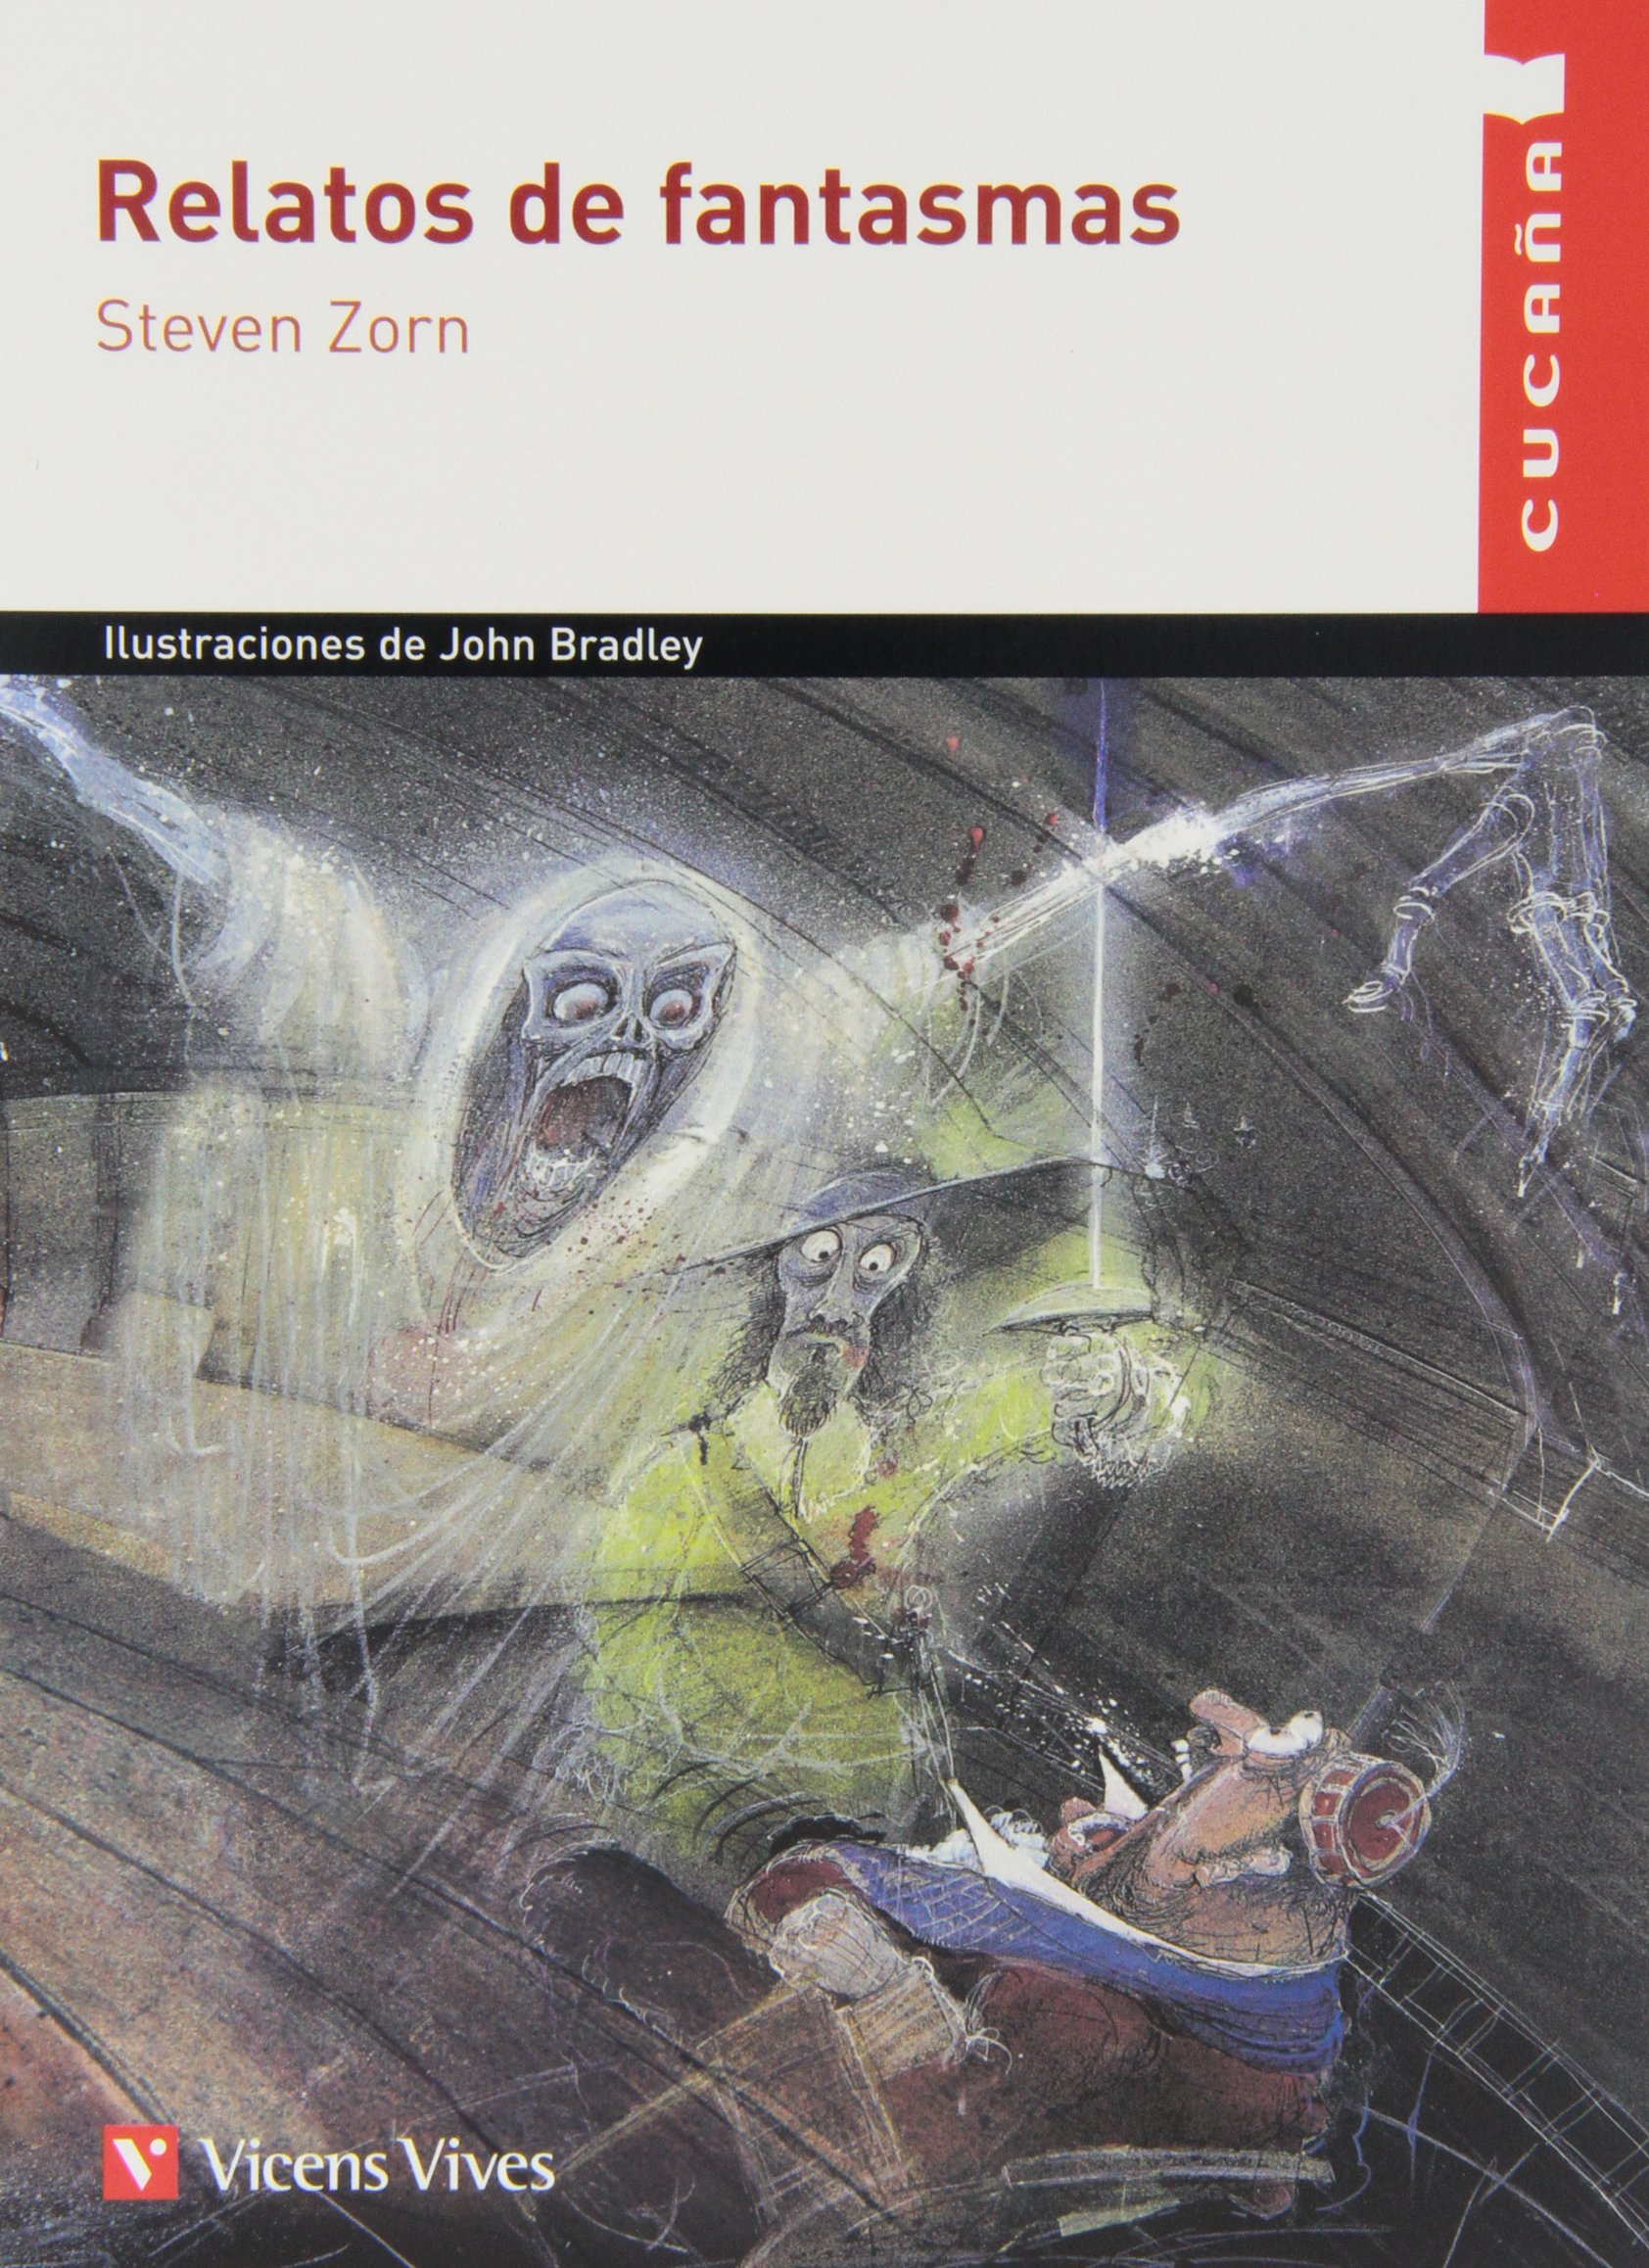 Relatos De Fantasmas N/c Colección Cucaña - 9788431647513: Amazon.es: Zorn, Steven, Santamaria España, Josep, Alonso Alvarez, Pedro, Torres Oliver, Francisco: Libros